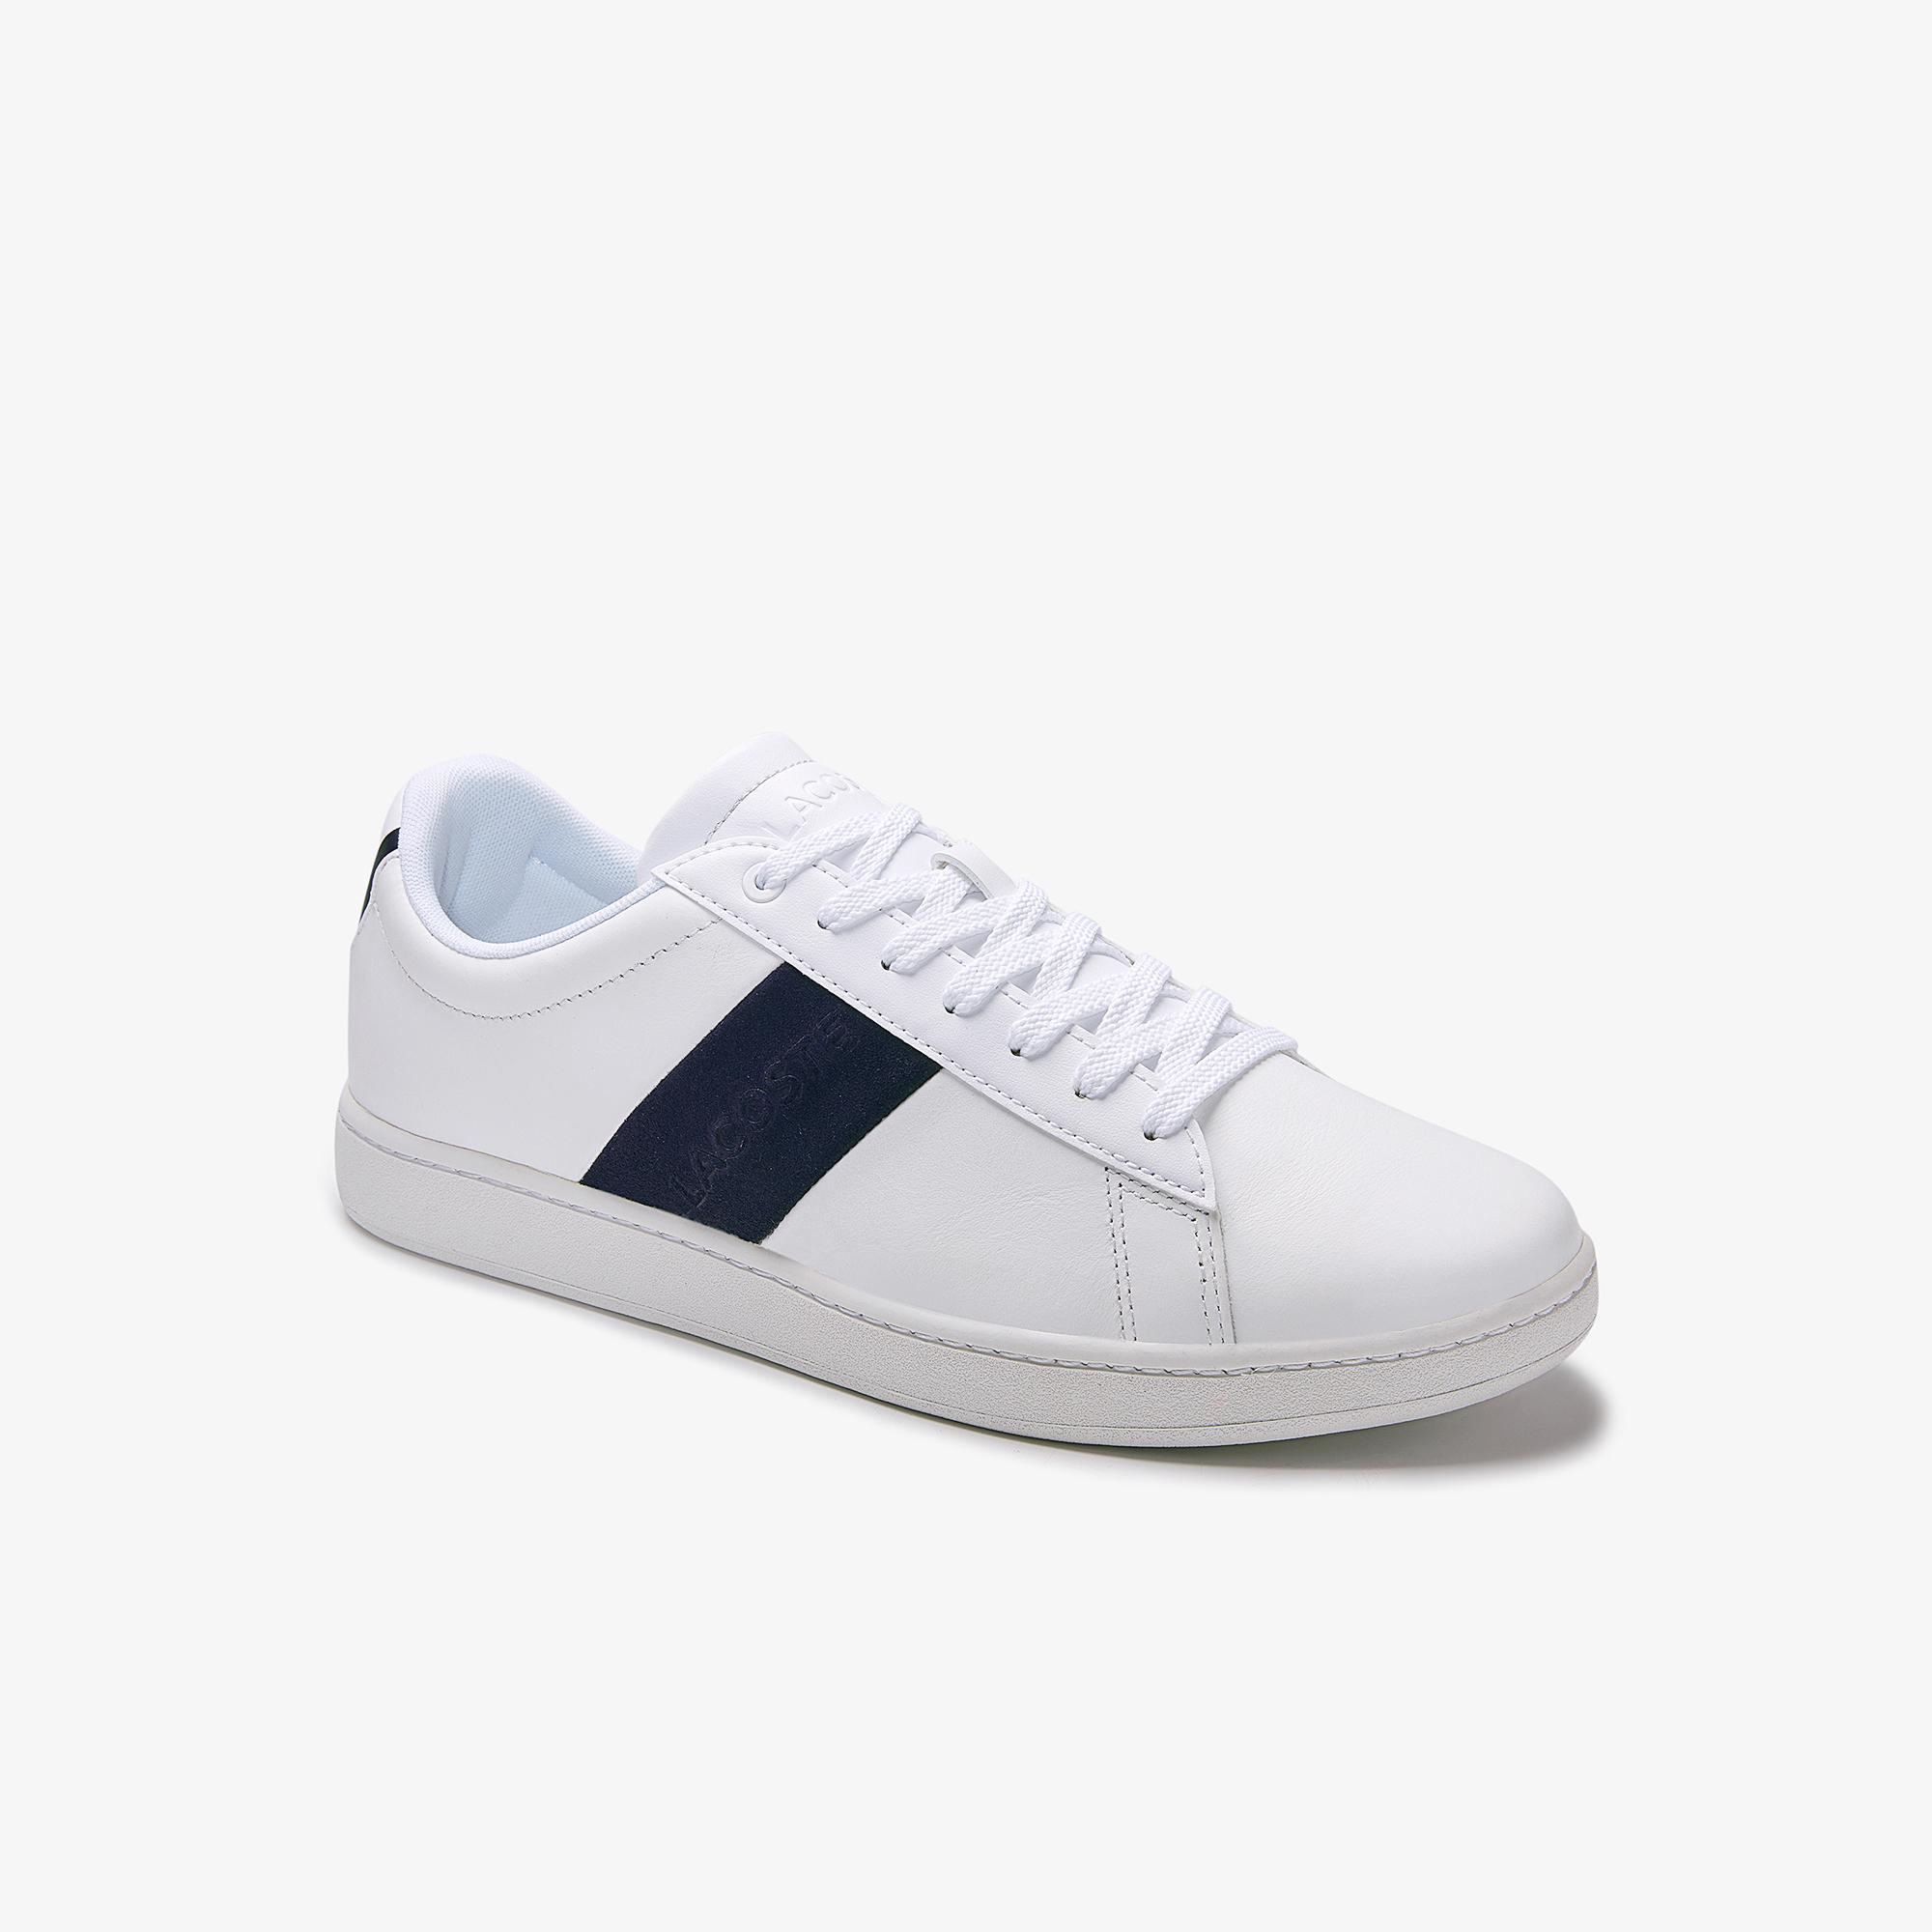 Lacoste Carnaby Evo Erkek Deri Beyaz-Lacivert Sneaker